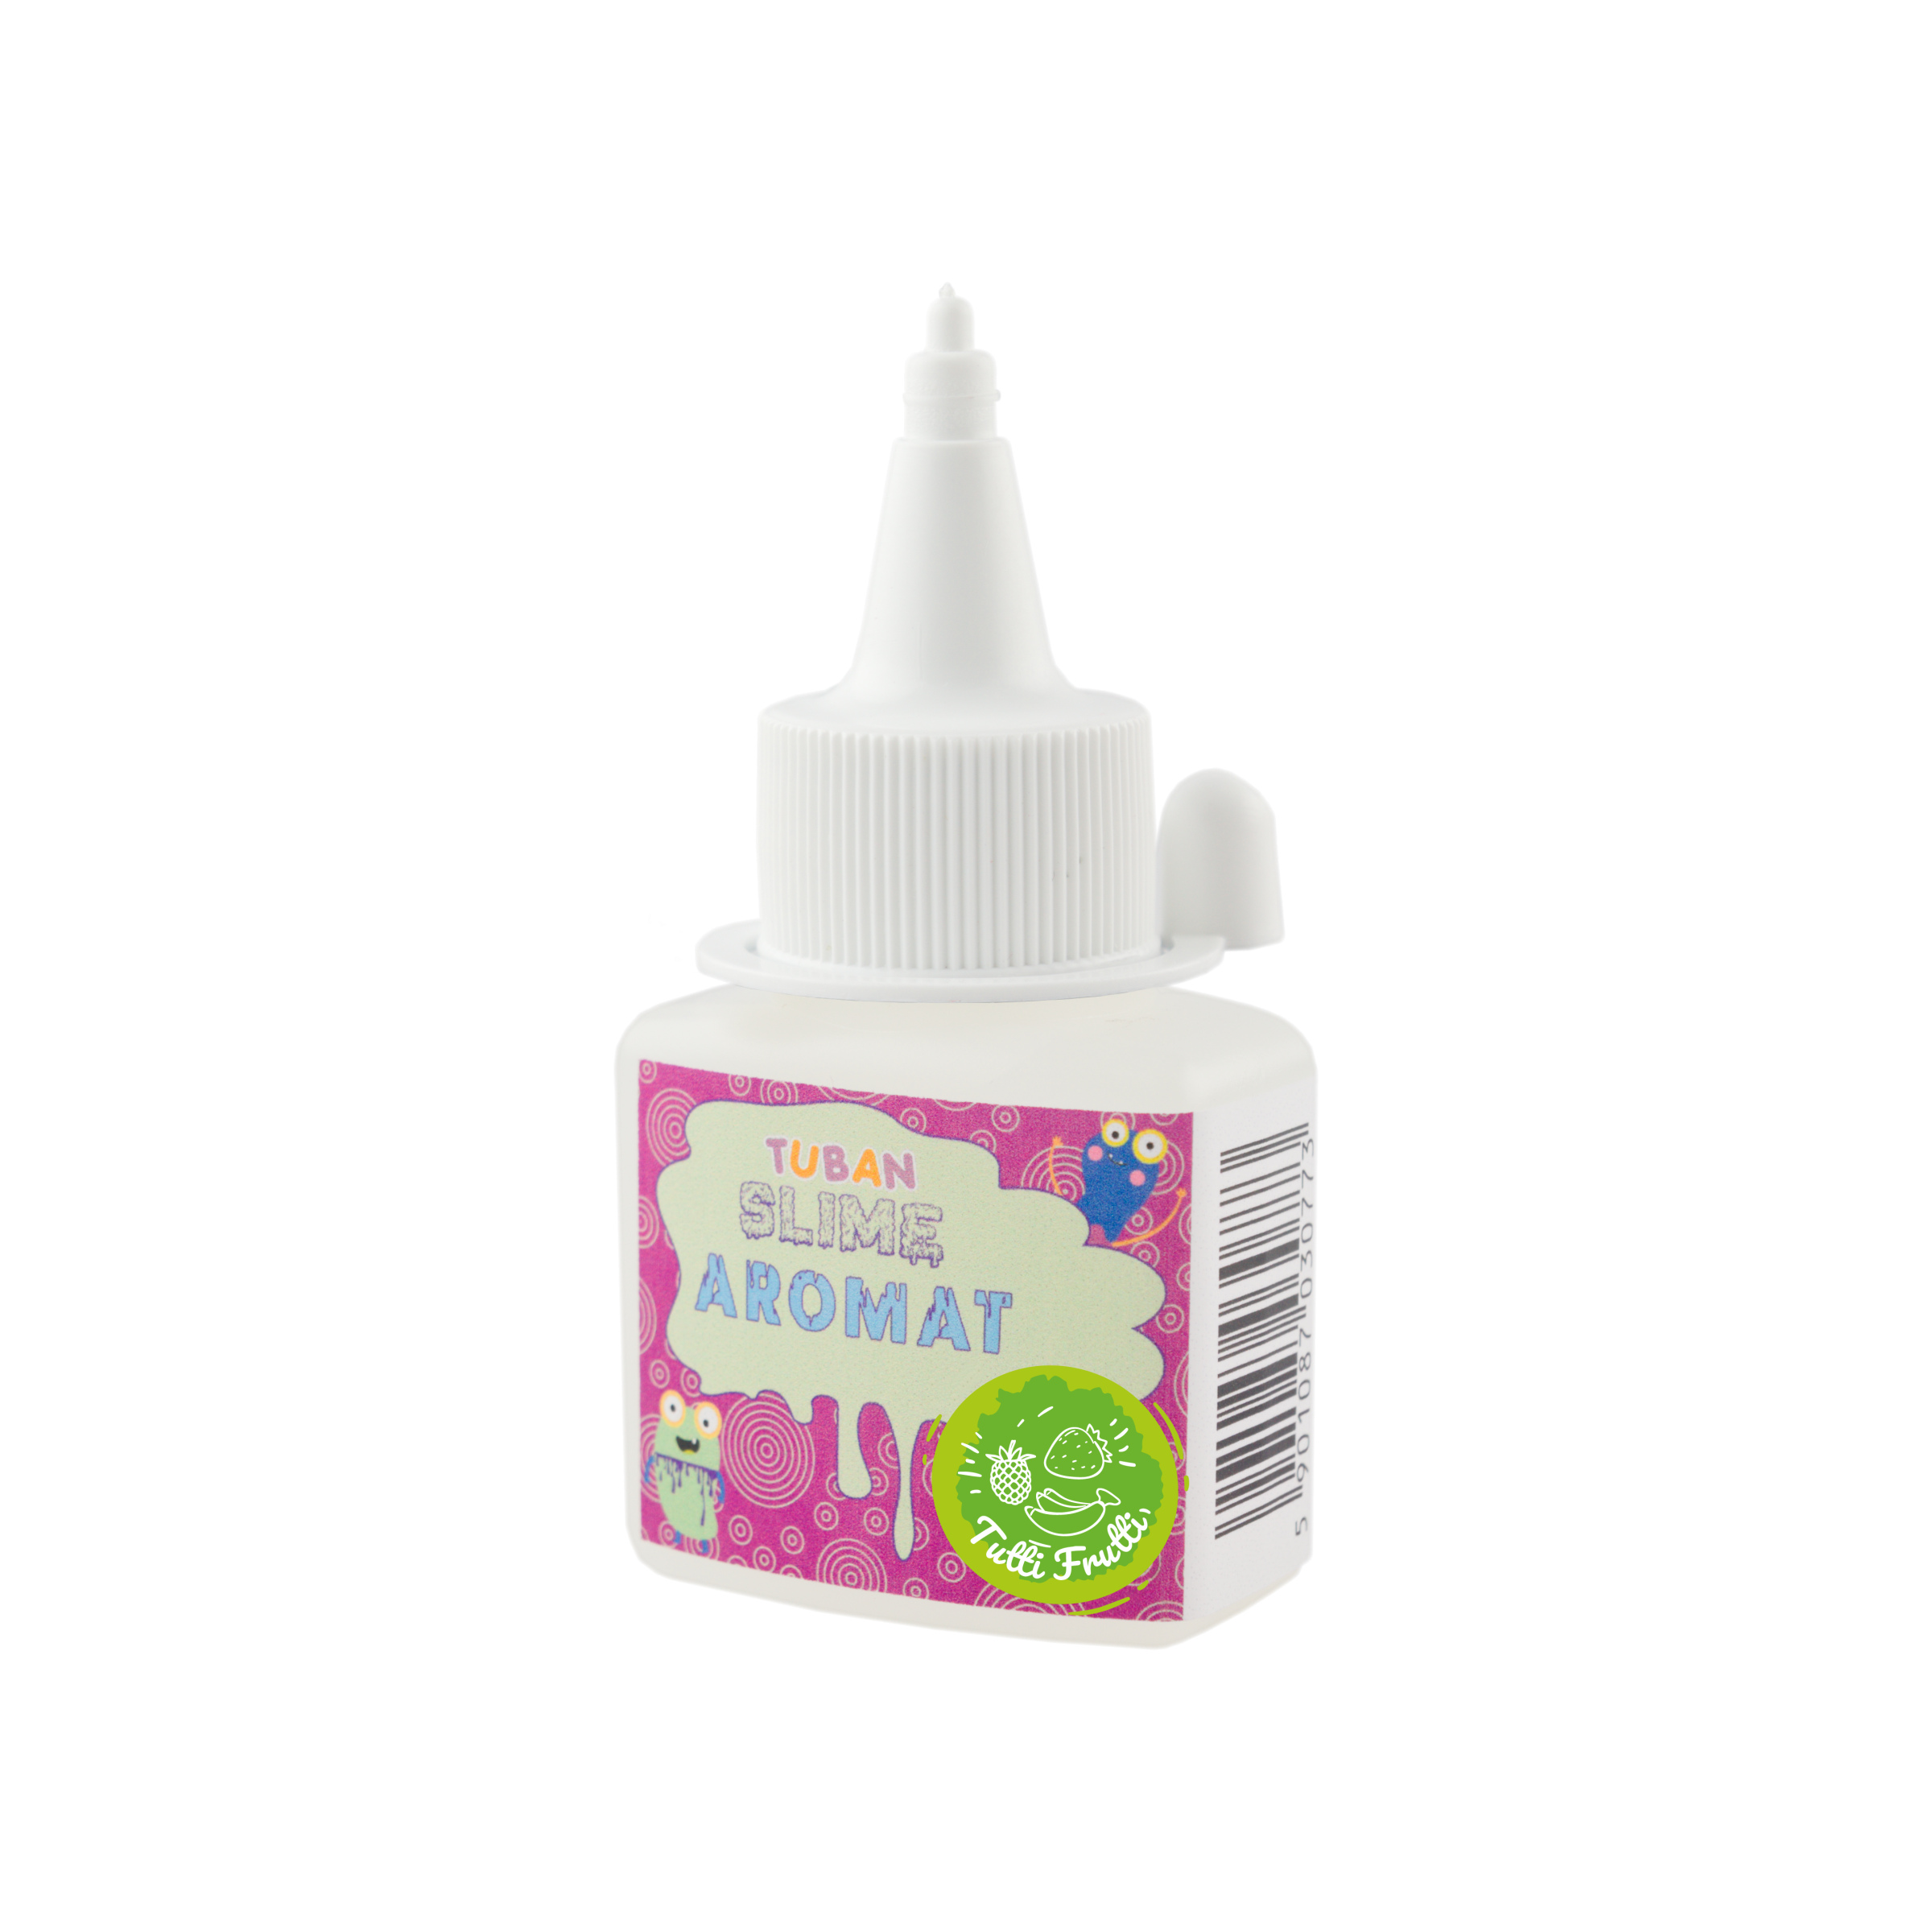 Tuban - Super Slime - Aroma mit Tutti-Frutti-Duft - 35 ml - by Jablka